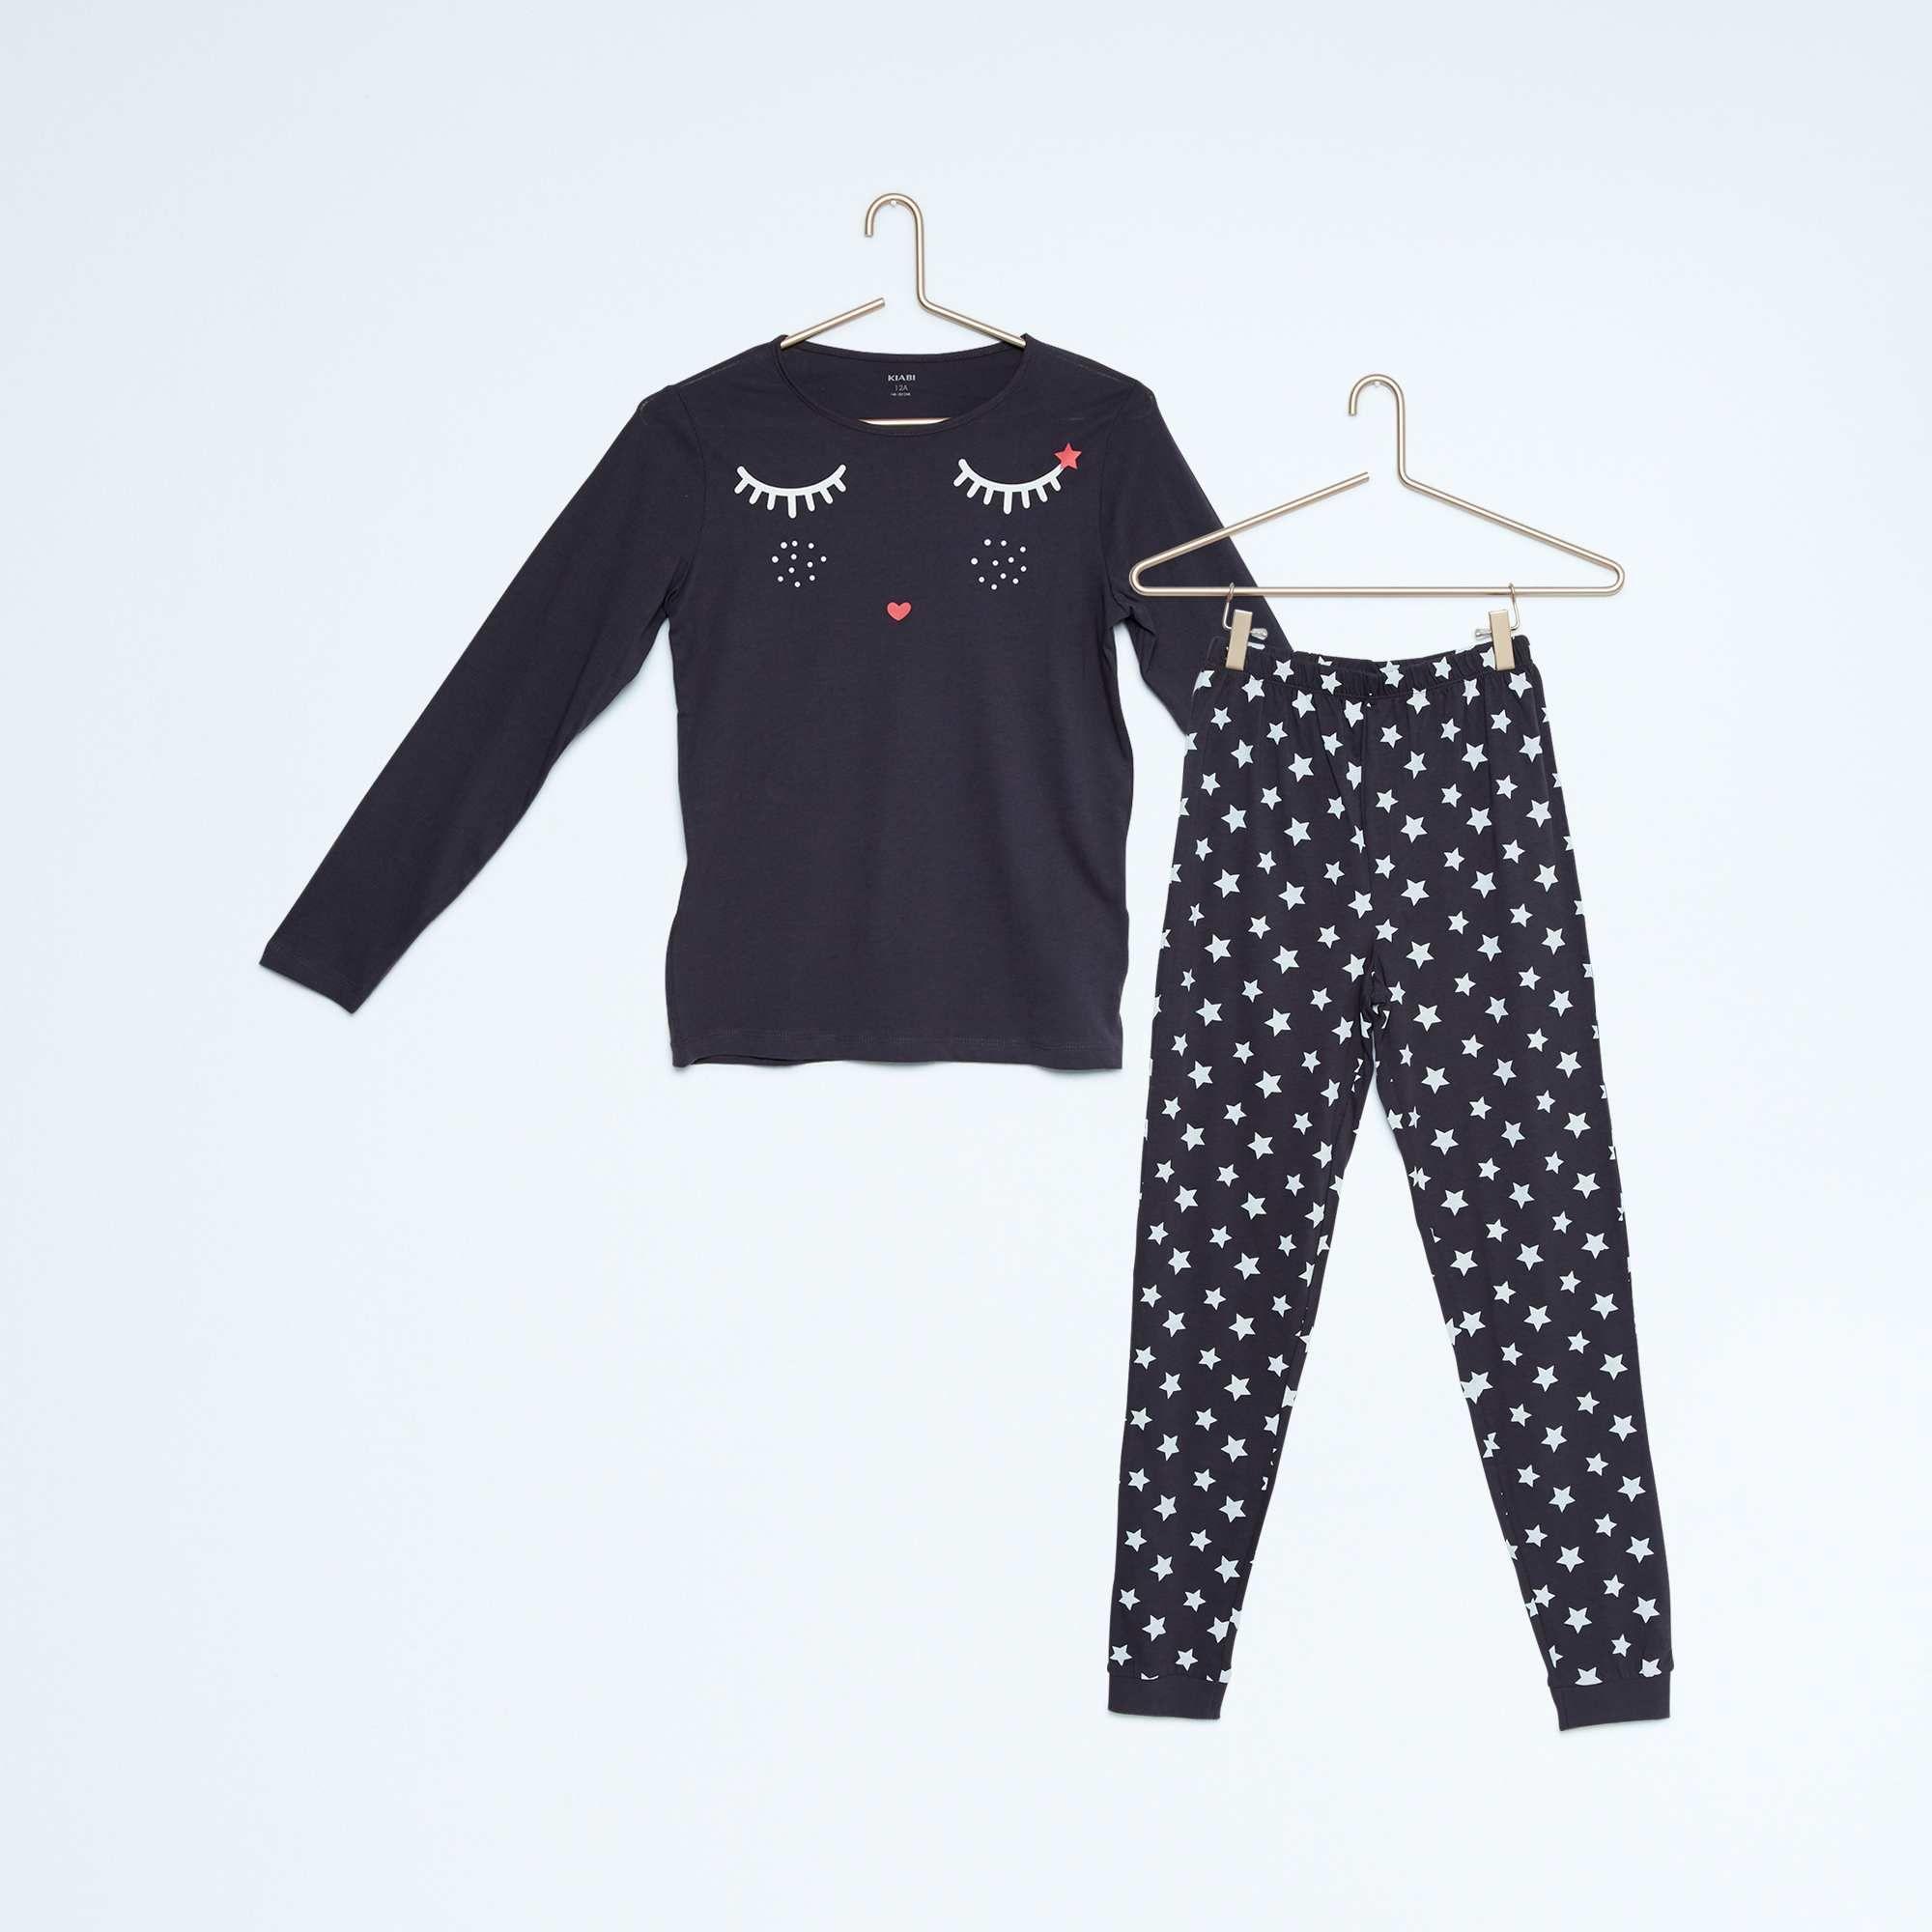 Pyjama Long En Pur Coton Fille Kiabi 8 00 Pyjama